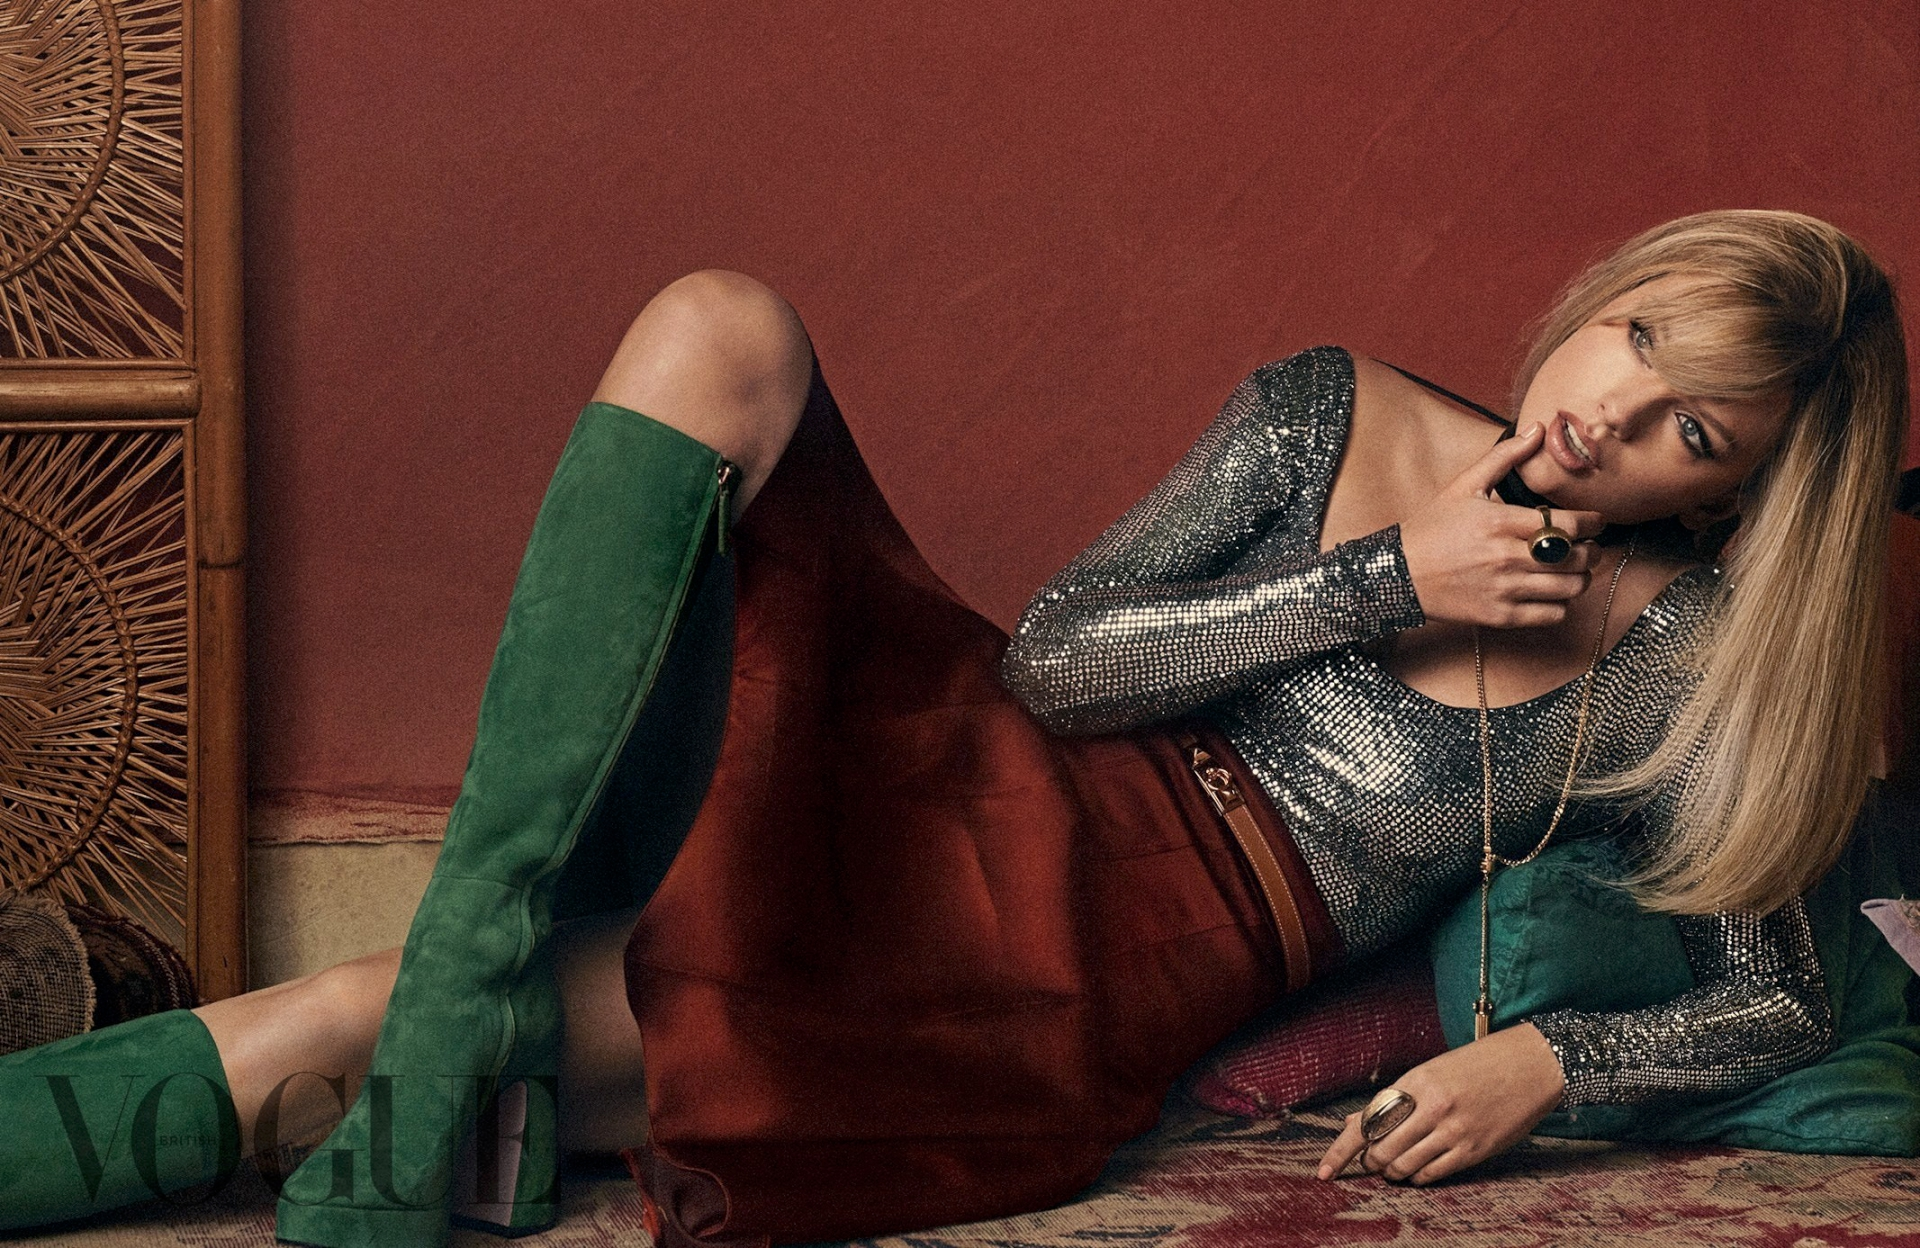 Taylor Swift Sexy Photoshoot